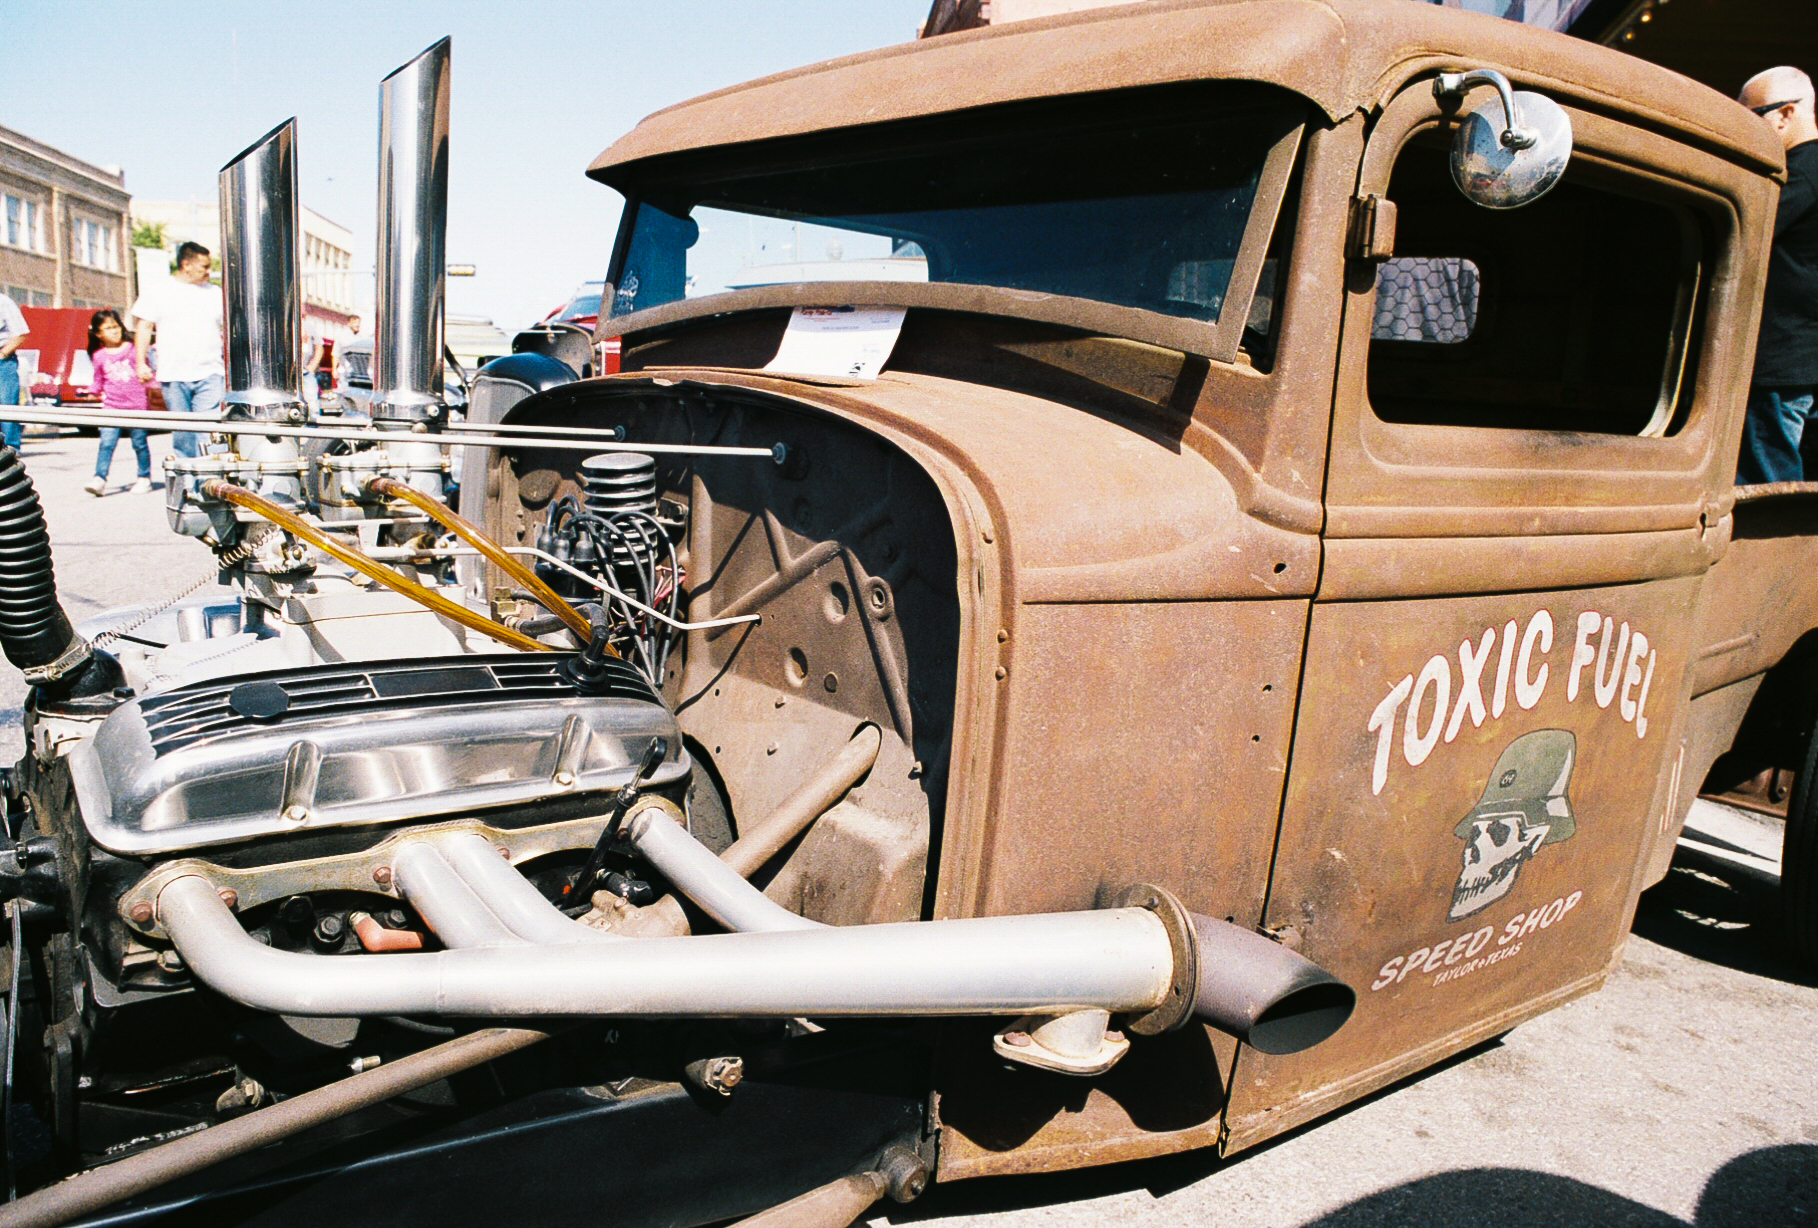 taylor-main-street-car-show-2016-25.jpg